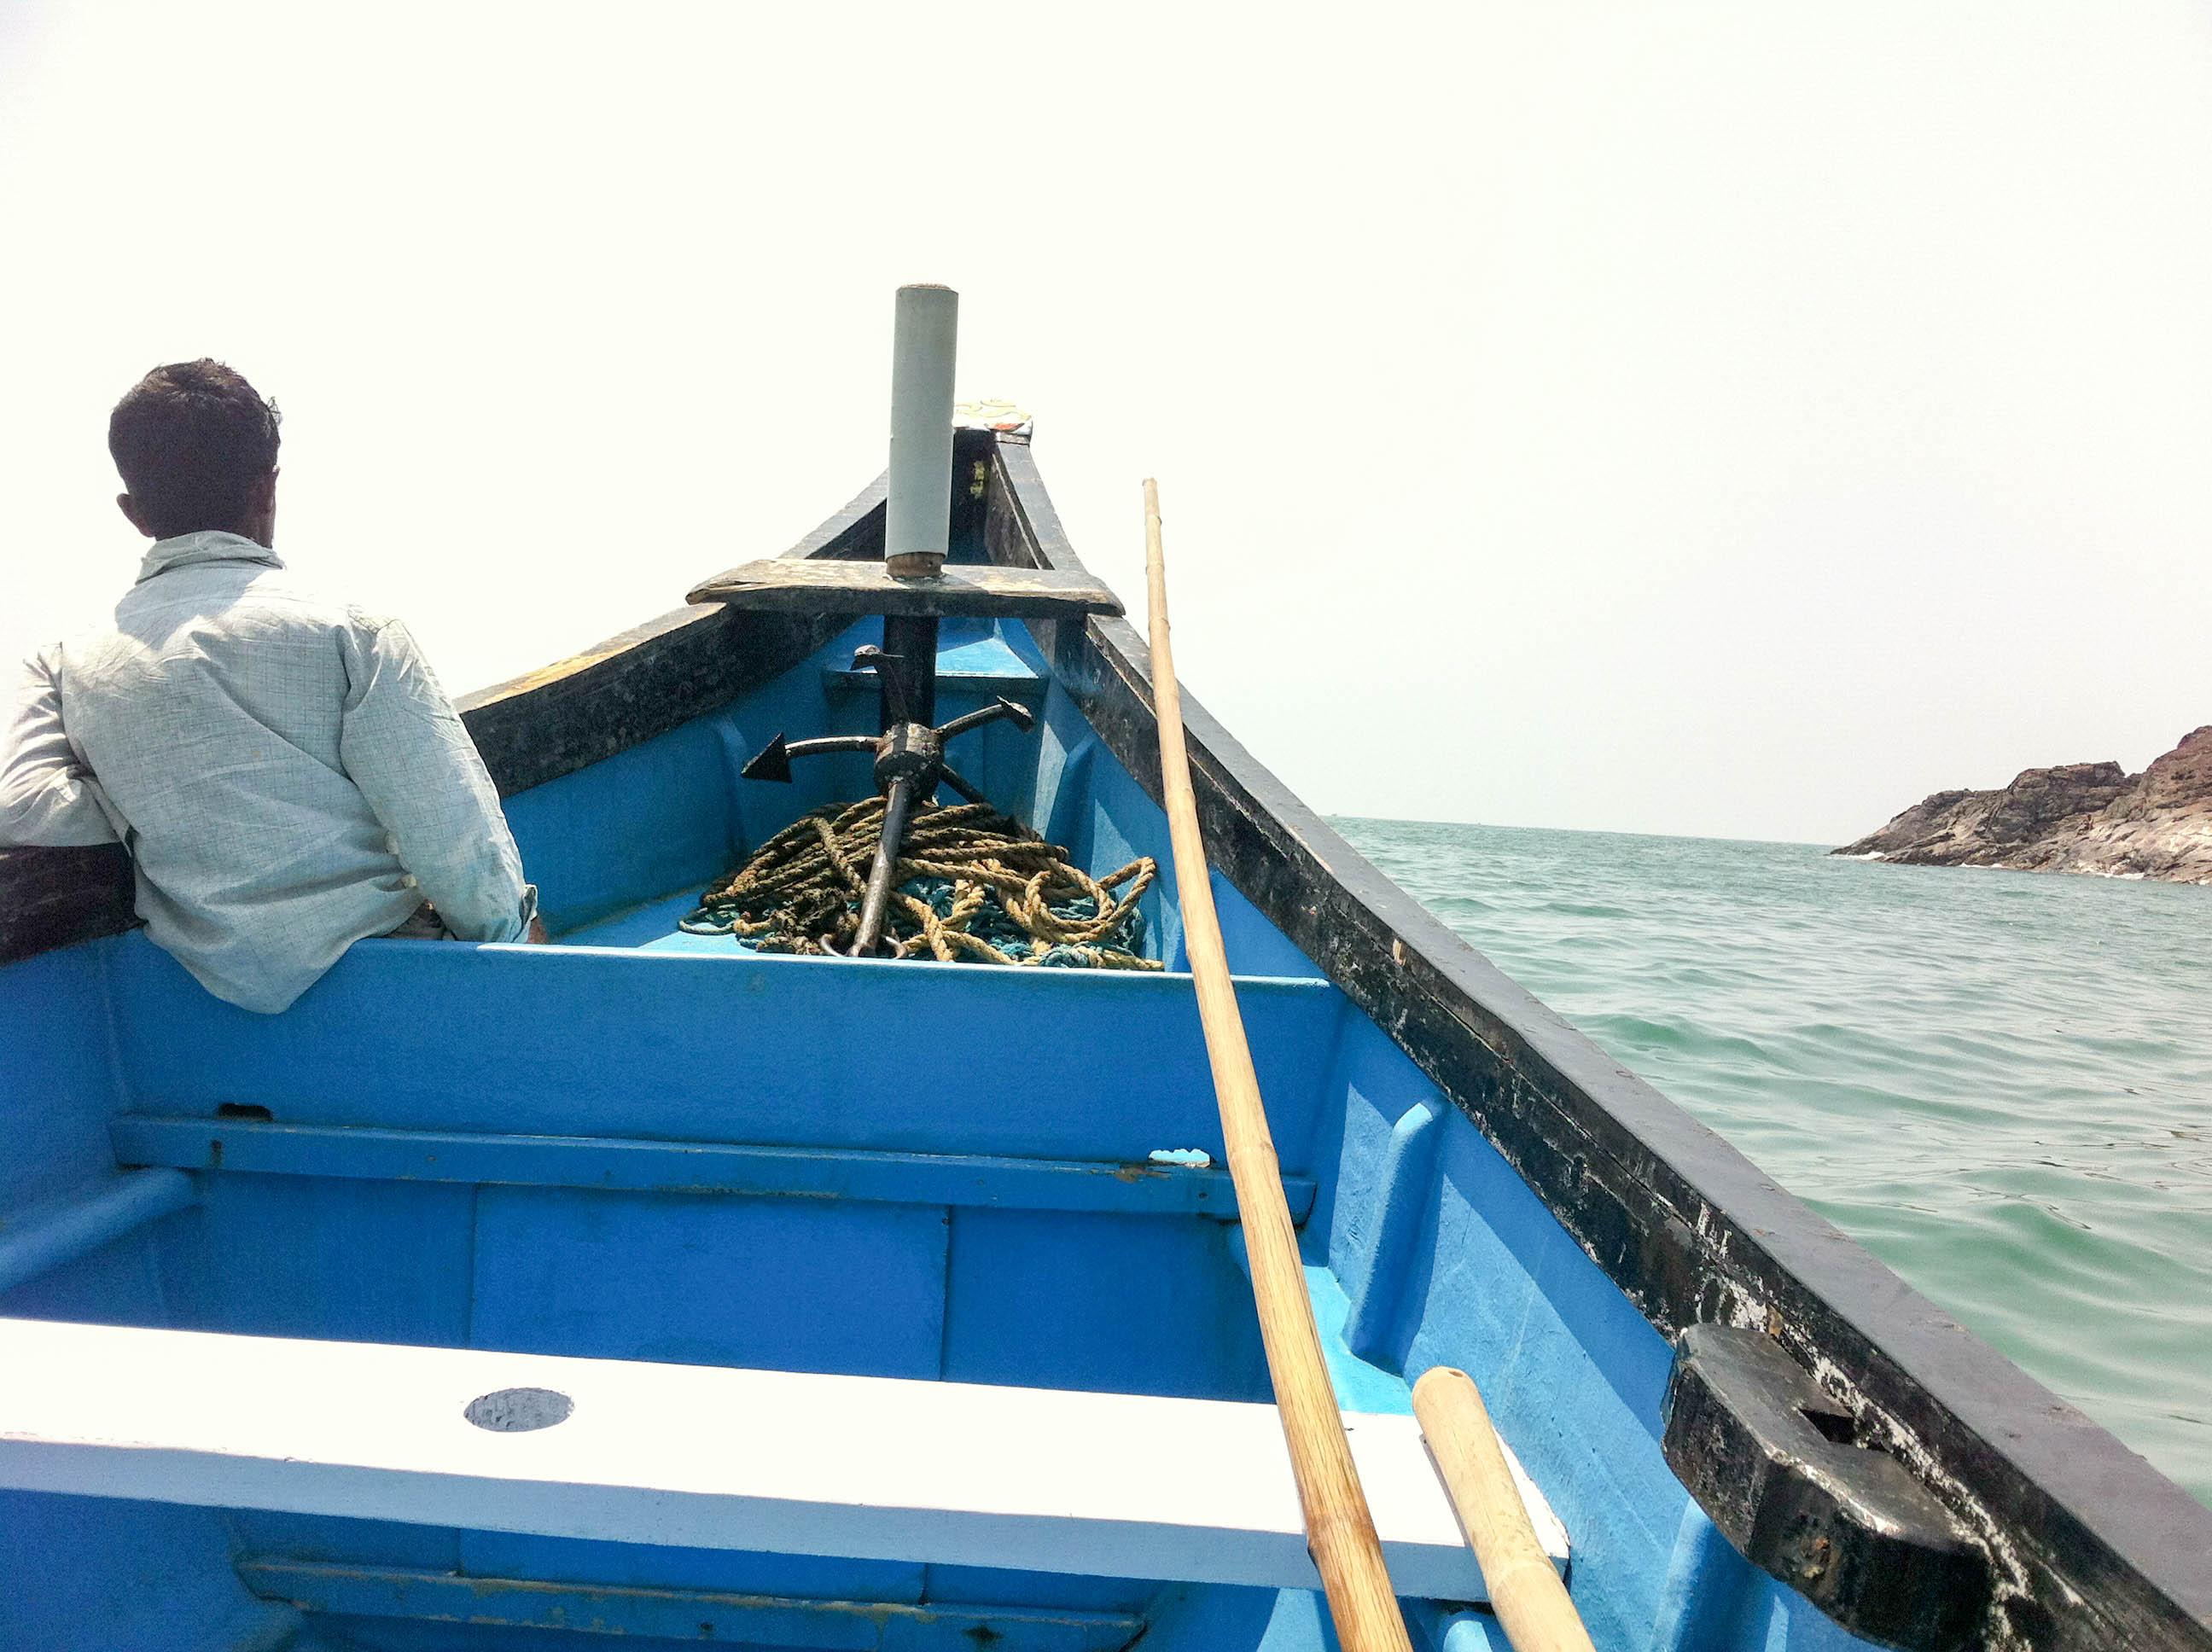 Boat ride, Gokarna